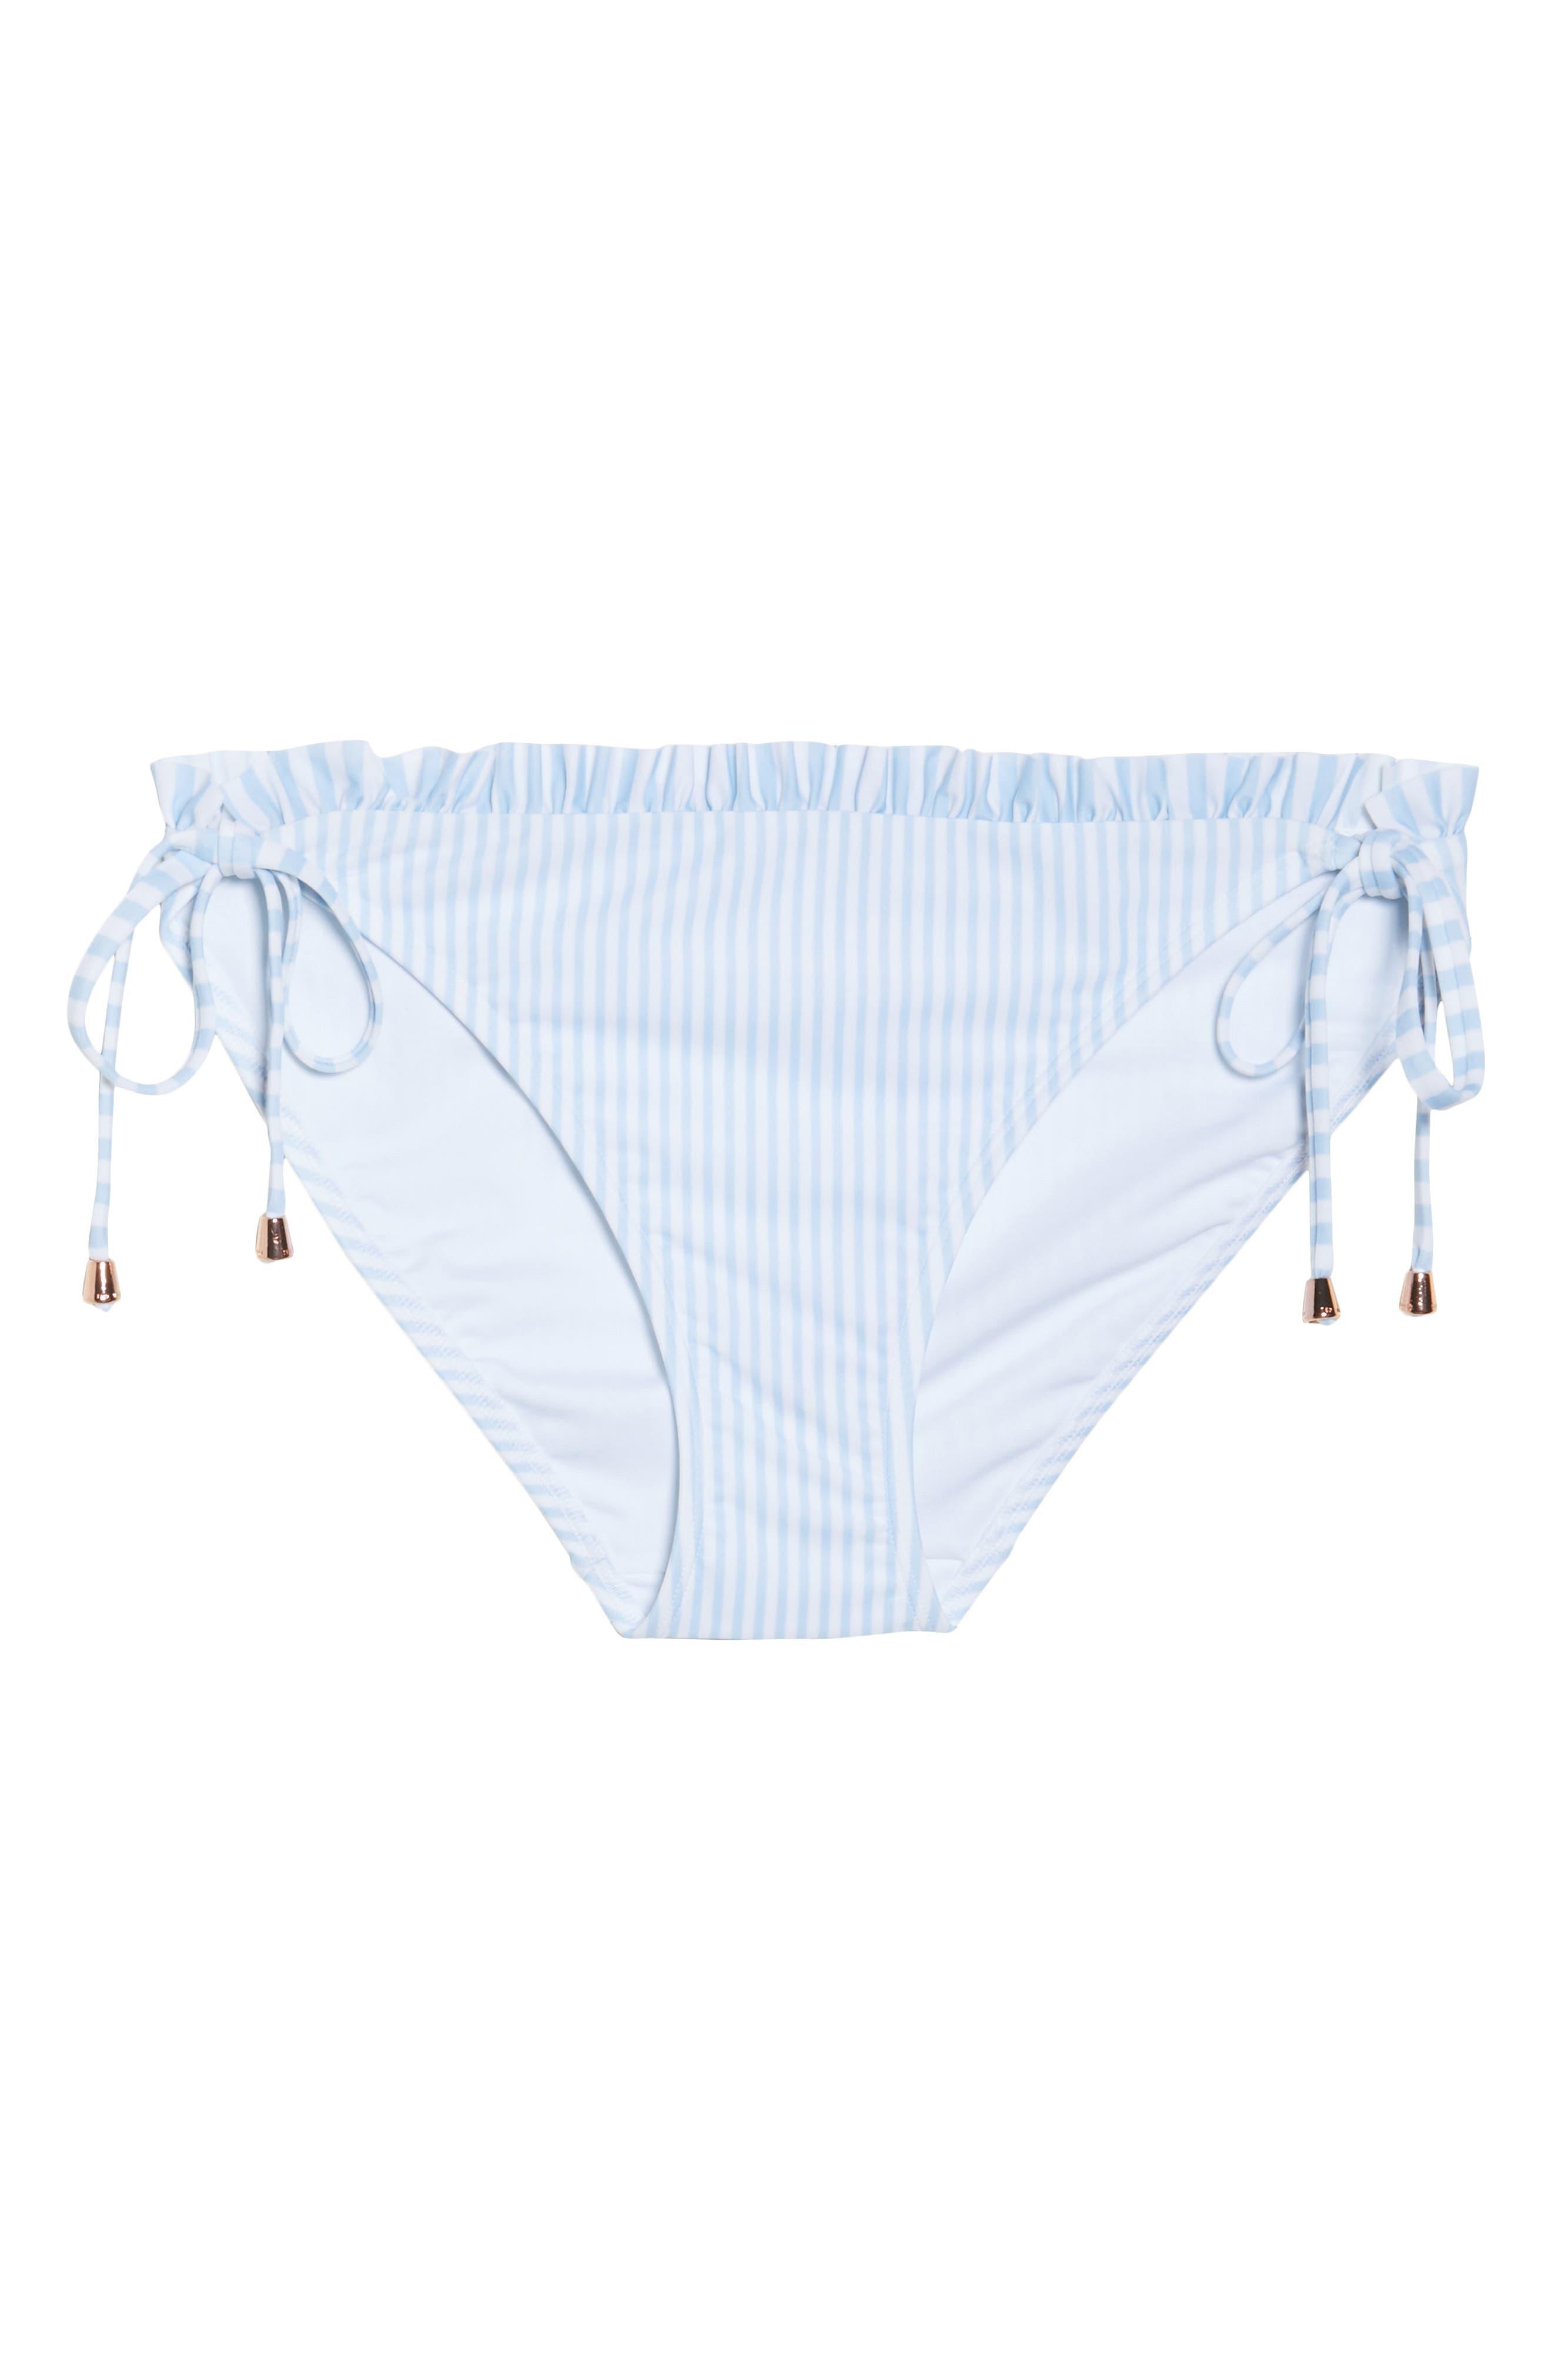 Side Tie Bikini Bottoms,                             Alternate thumbnail 9, color,                             Pale Blue